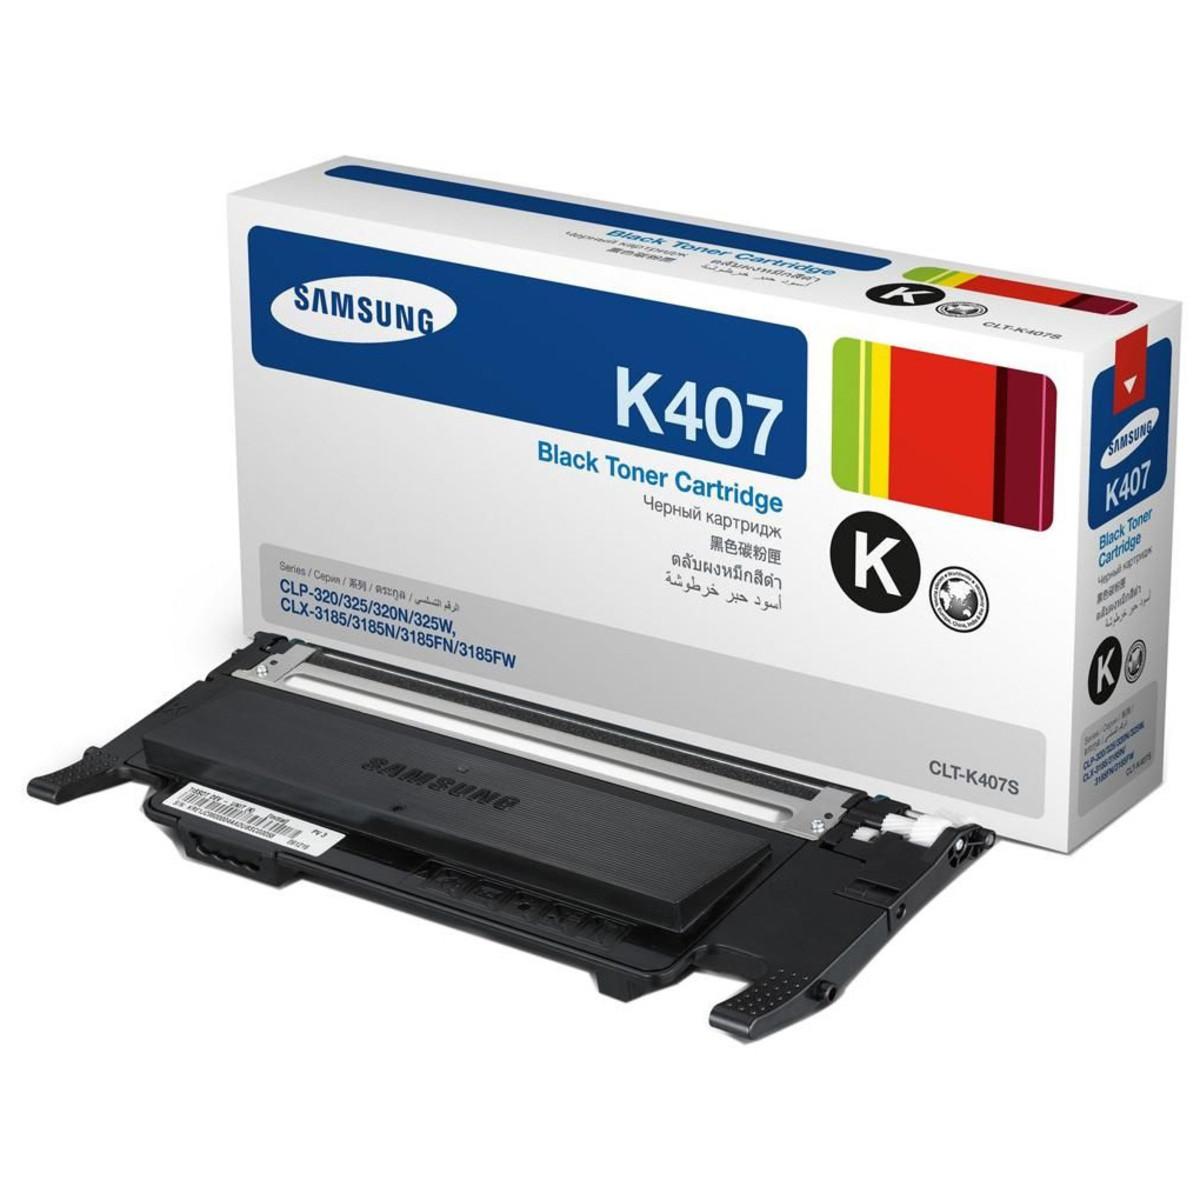 Samsung CLT-K407S Black Toner Cartridge